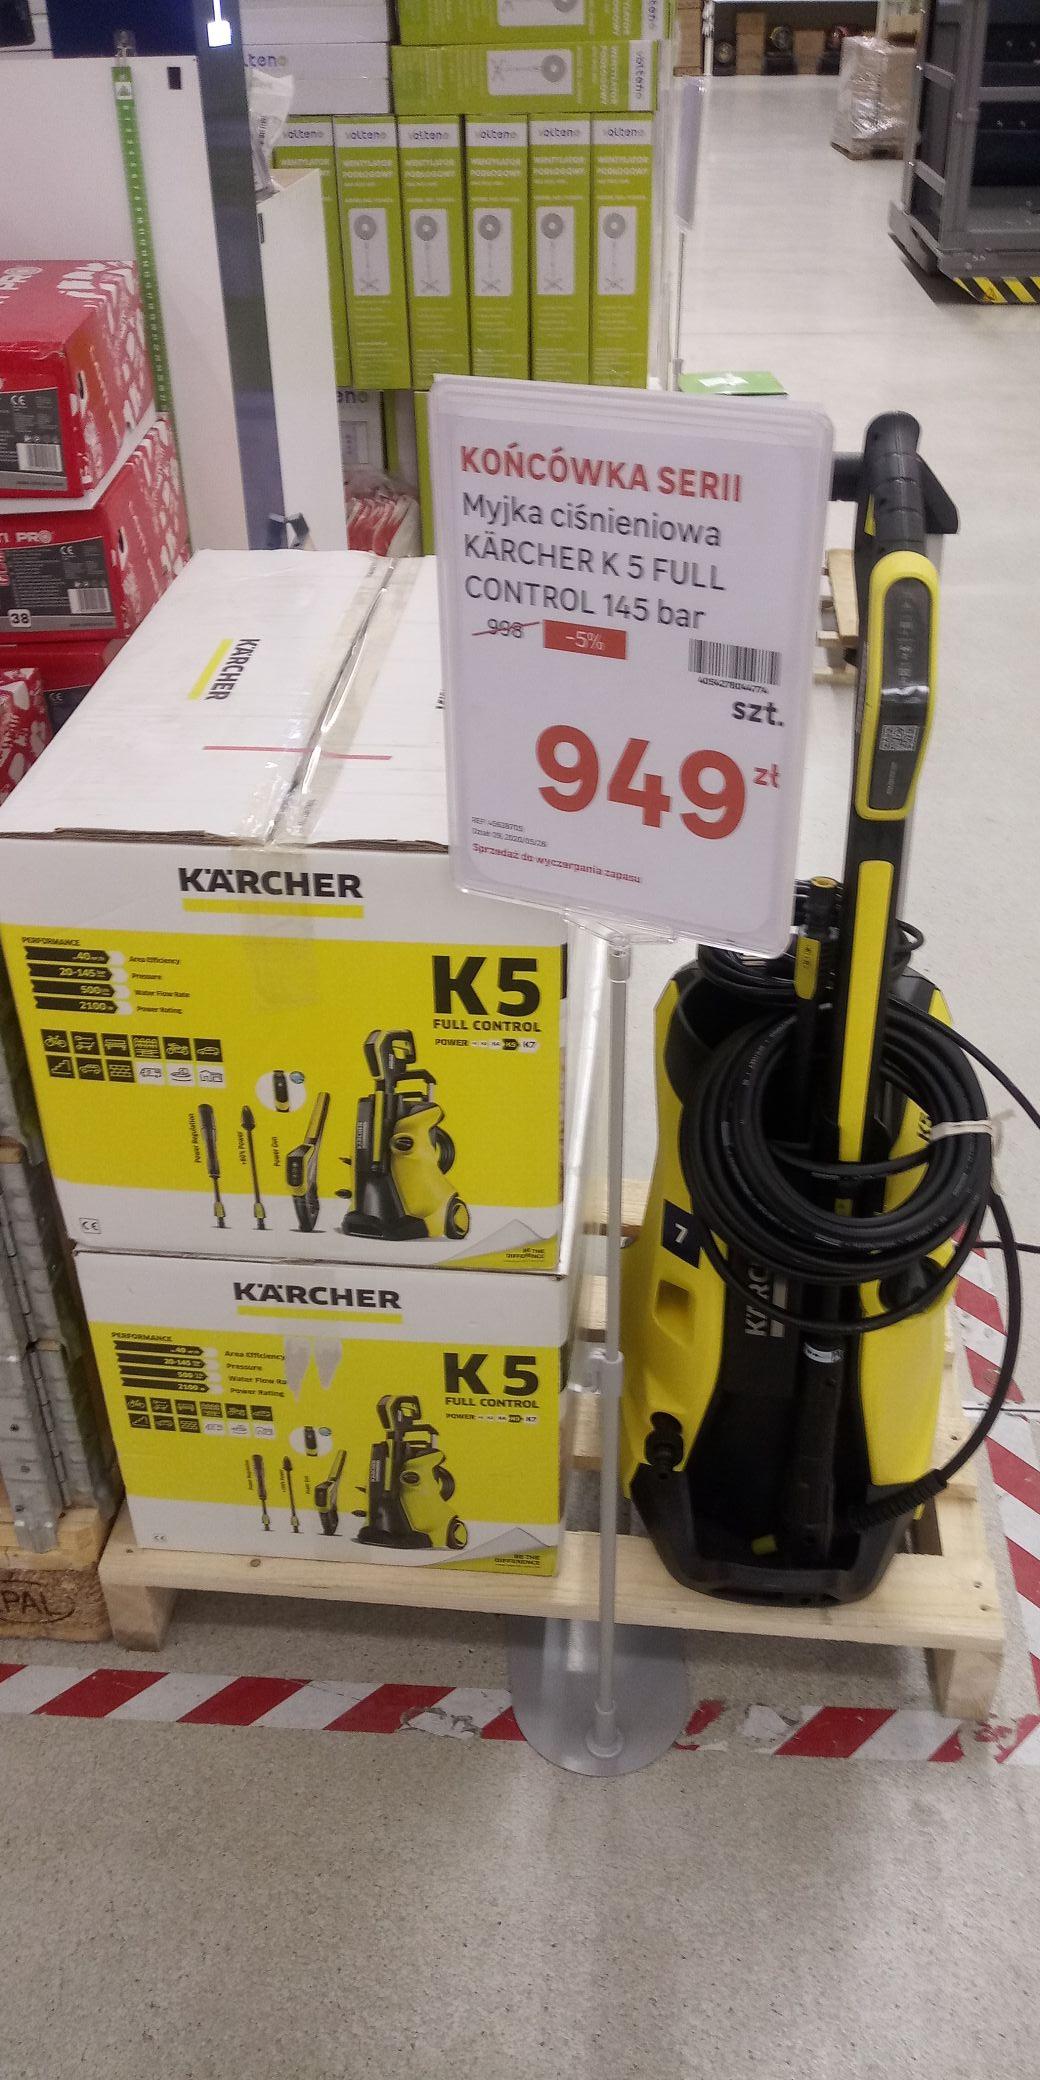 Myjka cisnieniowa karcher k5 full controll @Leroy Merlin (Katowice)